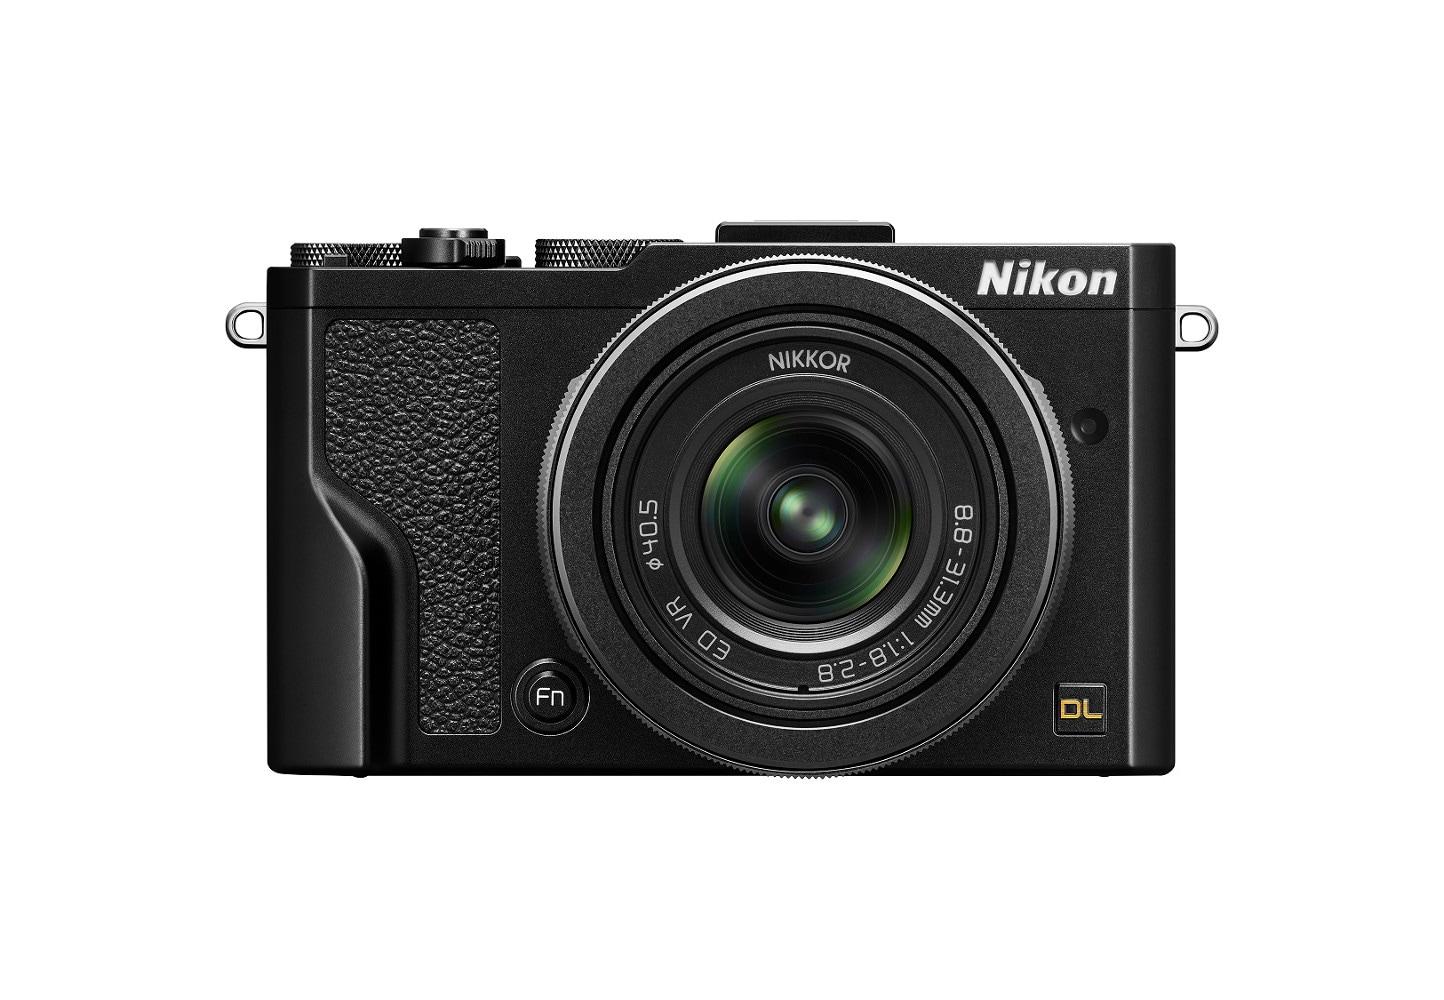 Nikon DL_24_85